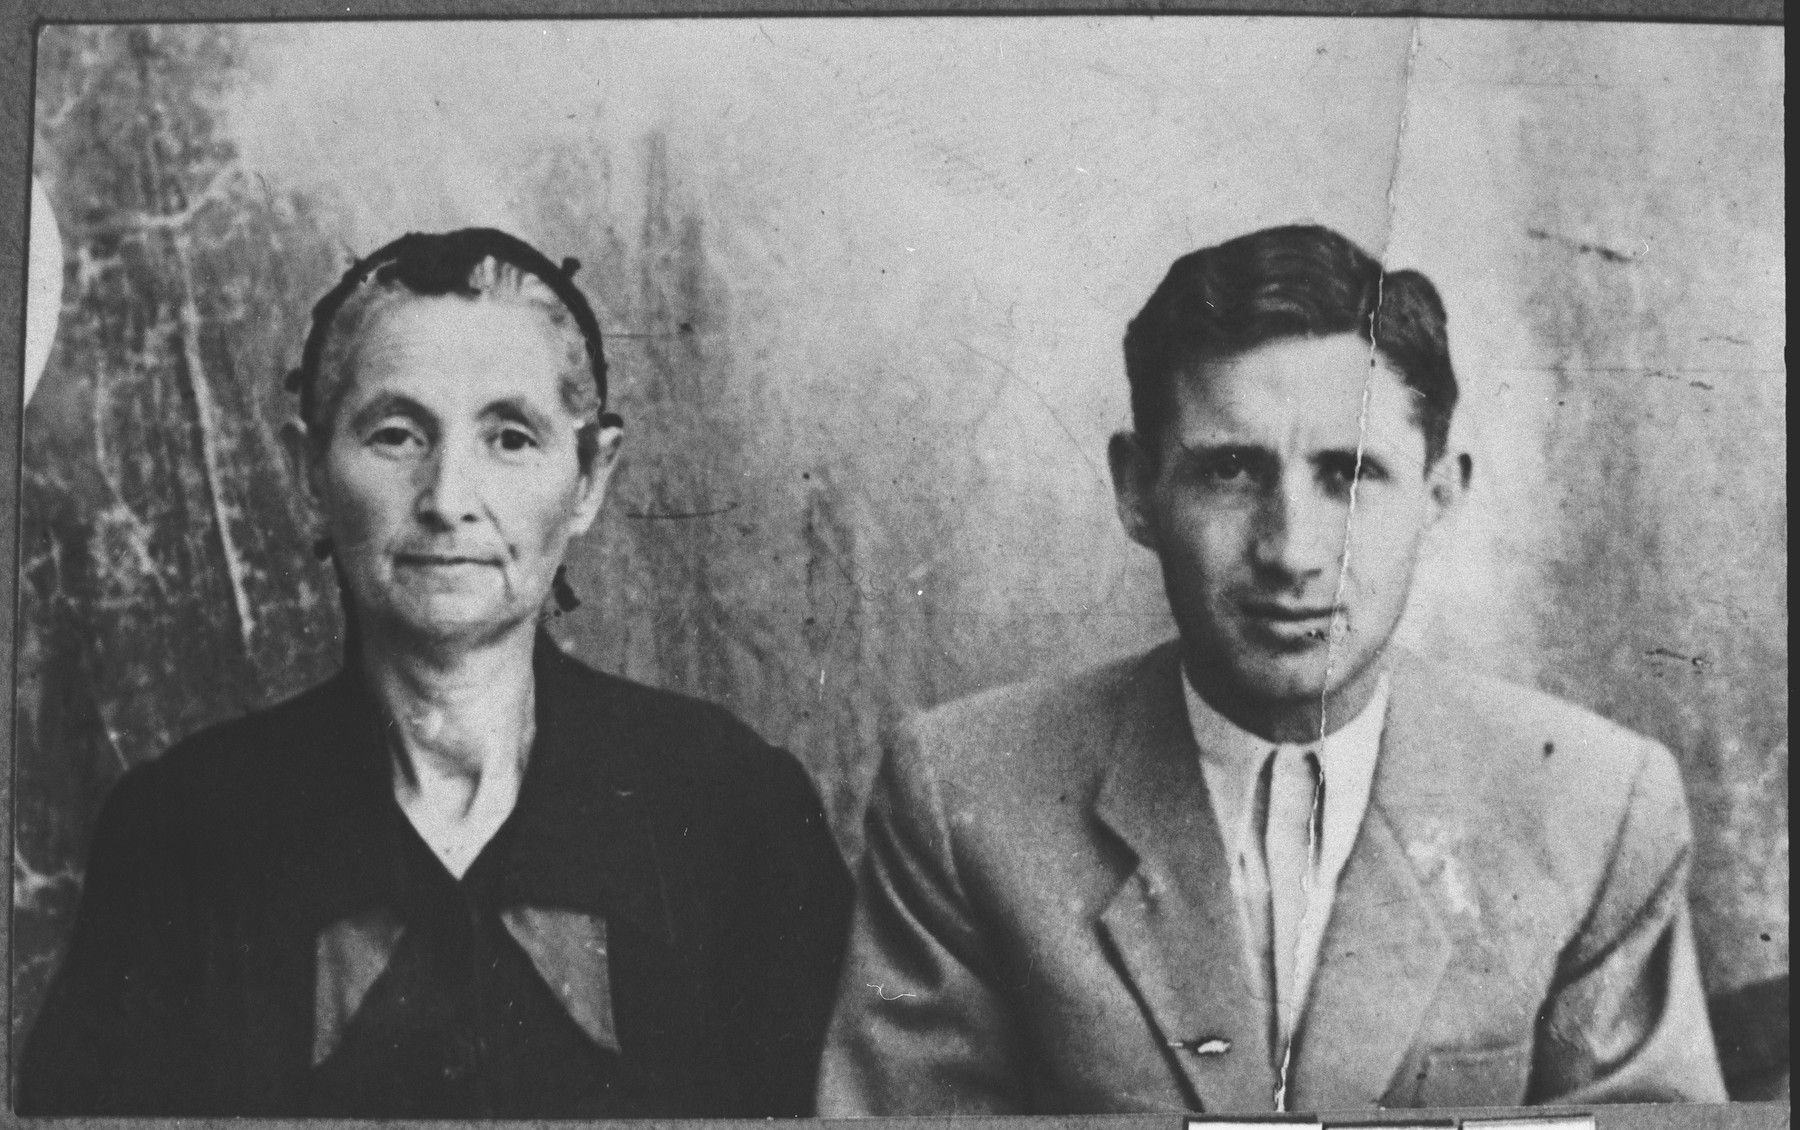 Portrait of Simaya Kalderon, son of Mois Kalderon, and his wife, Sara.  Simaya sold fancygoods.  They lived at Drinska 83 in Bitola.